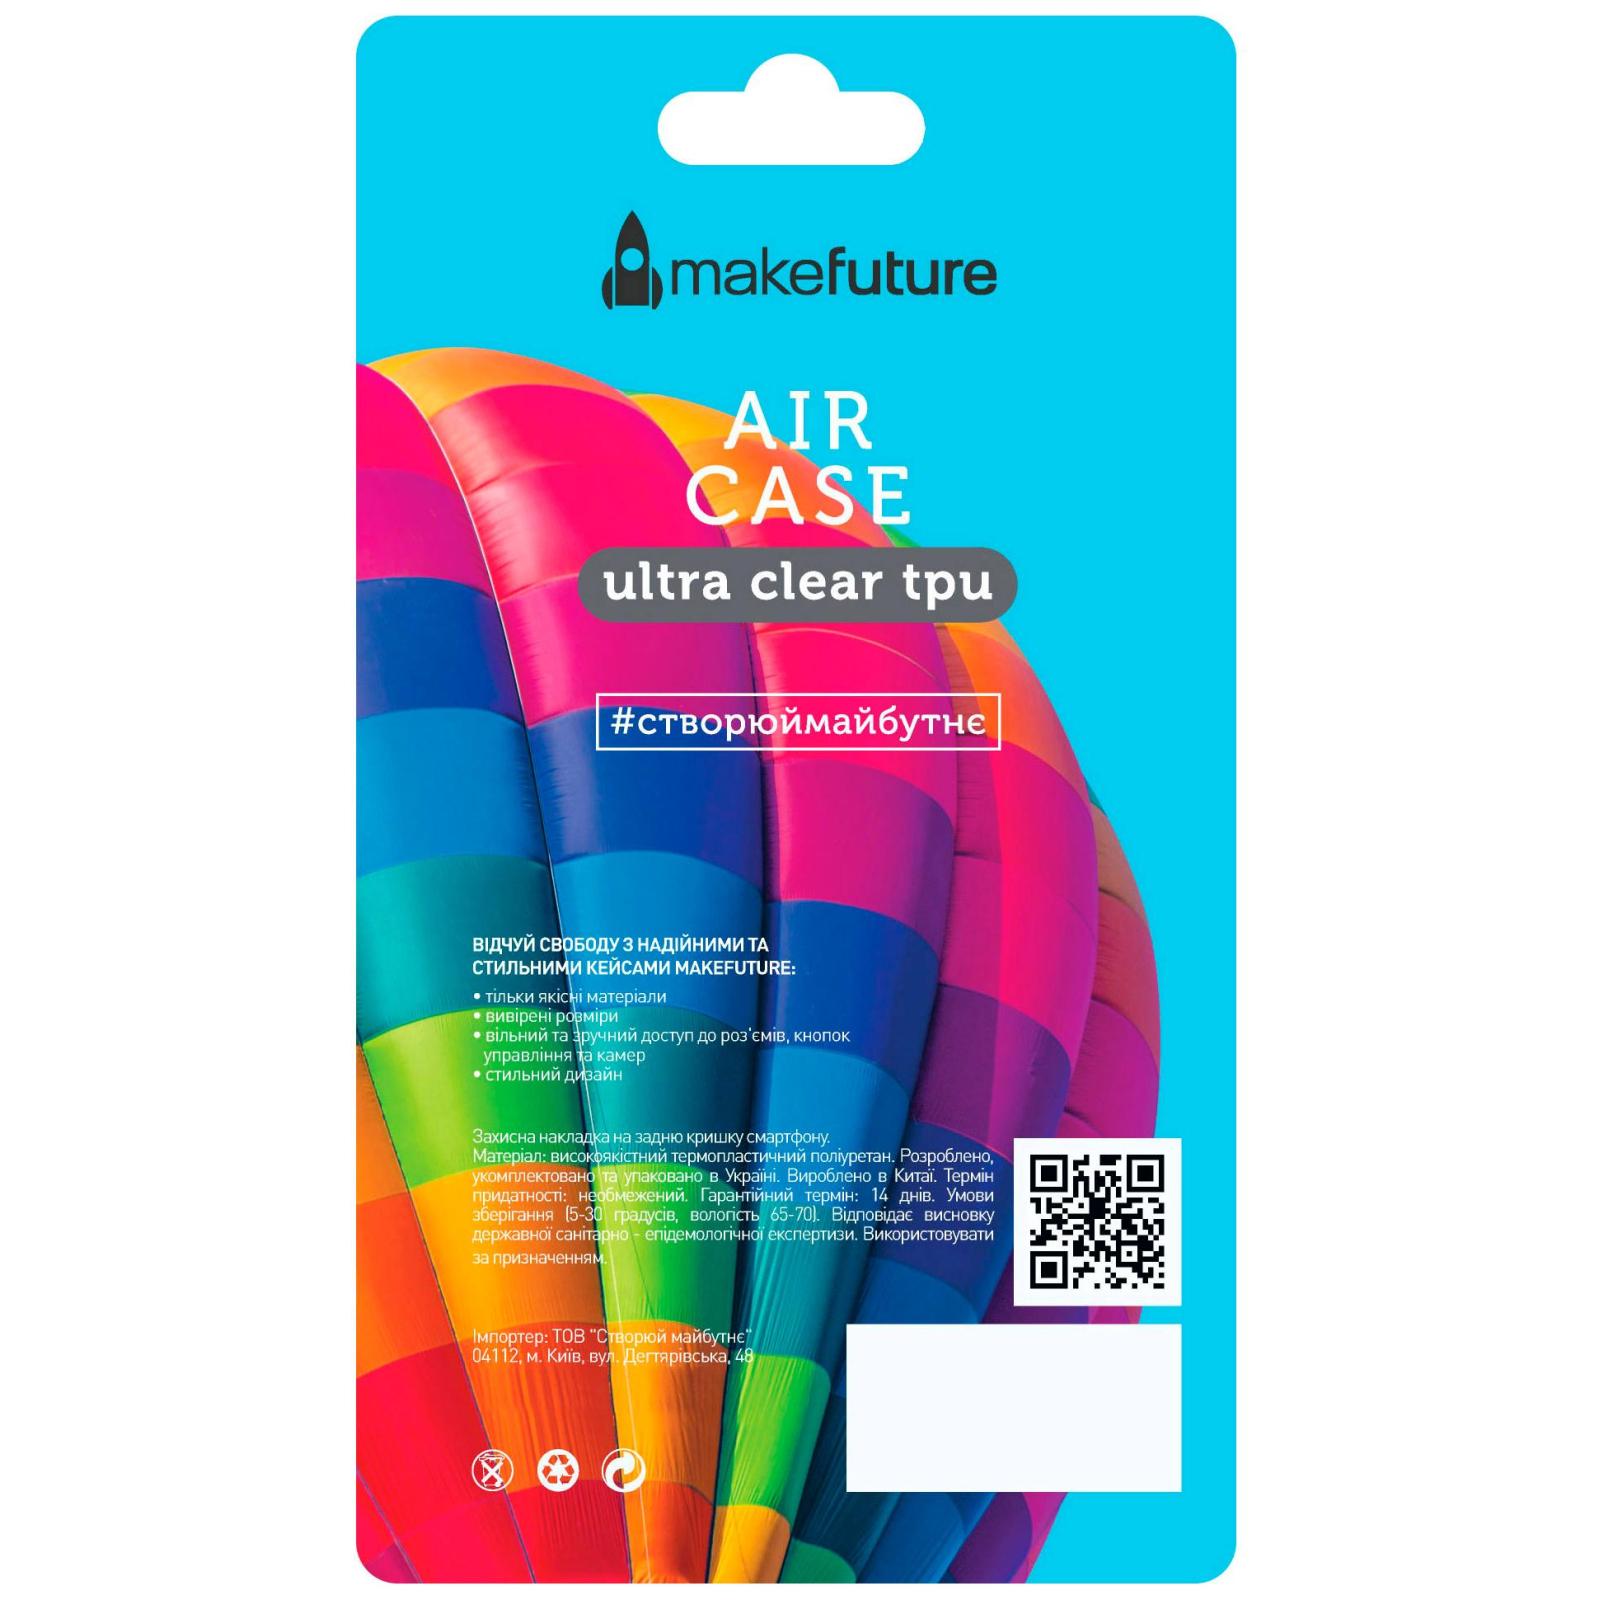 Чехол для моб. телефона MakeFuture Air Case (TPU) Huawei Y5 2018 Black (MCA-HUY518BK) изображение 4